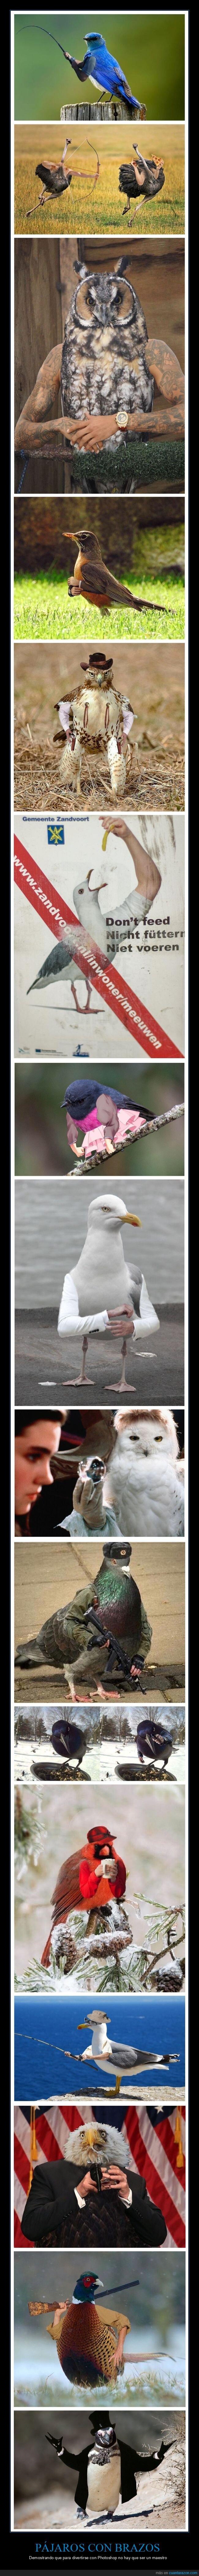 brazos,pájaros